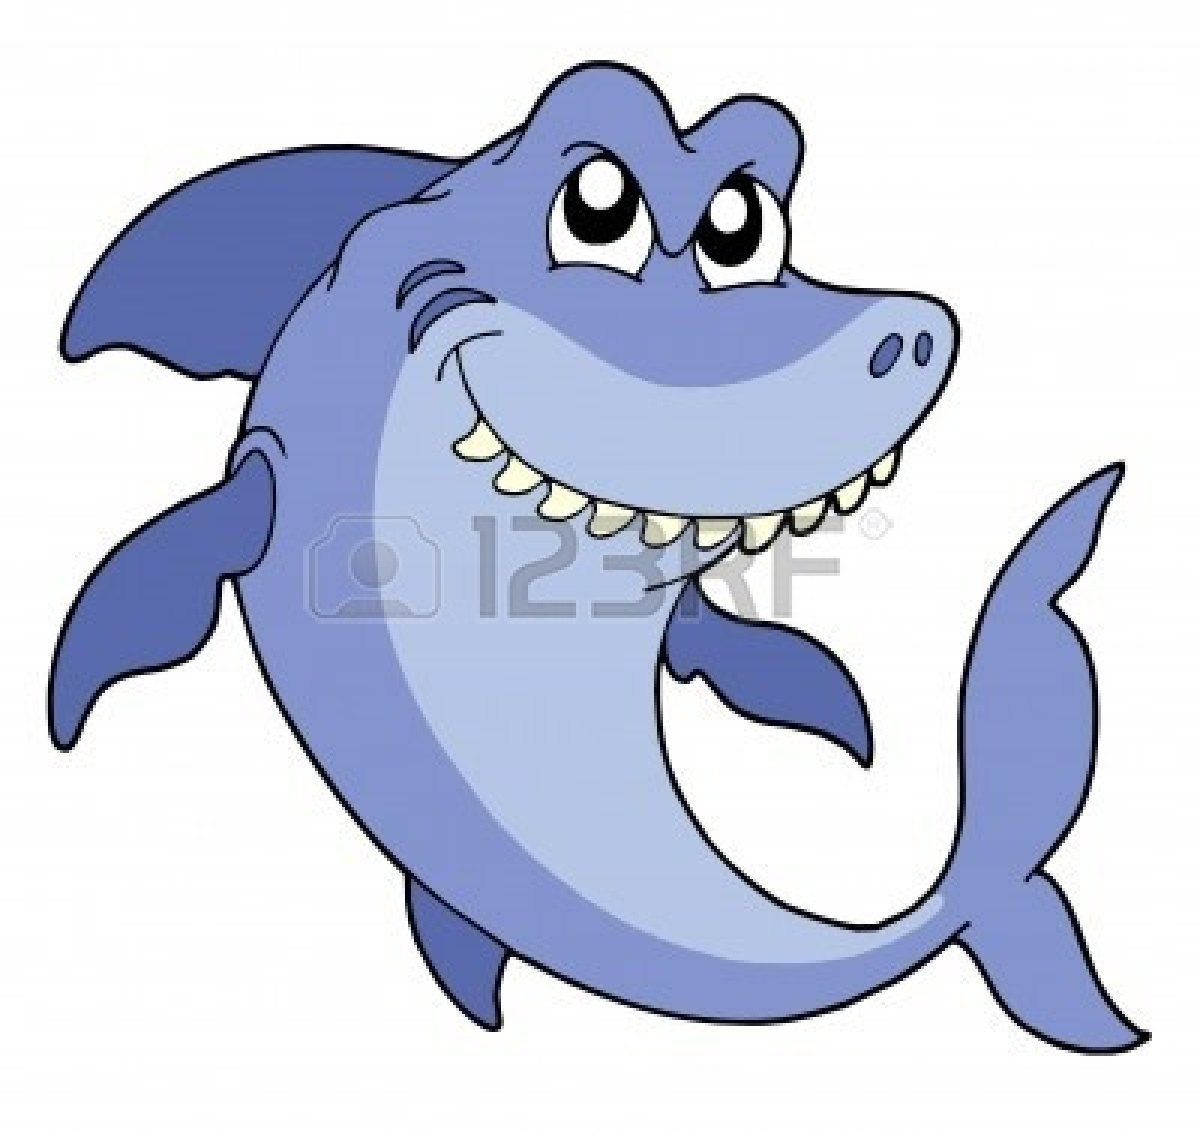 Smiling Shark Clipart | Clipart Panda - Free Clipart Images for Smiling Shark Clipart  131fsj